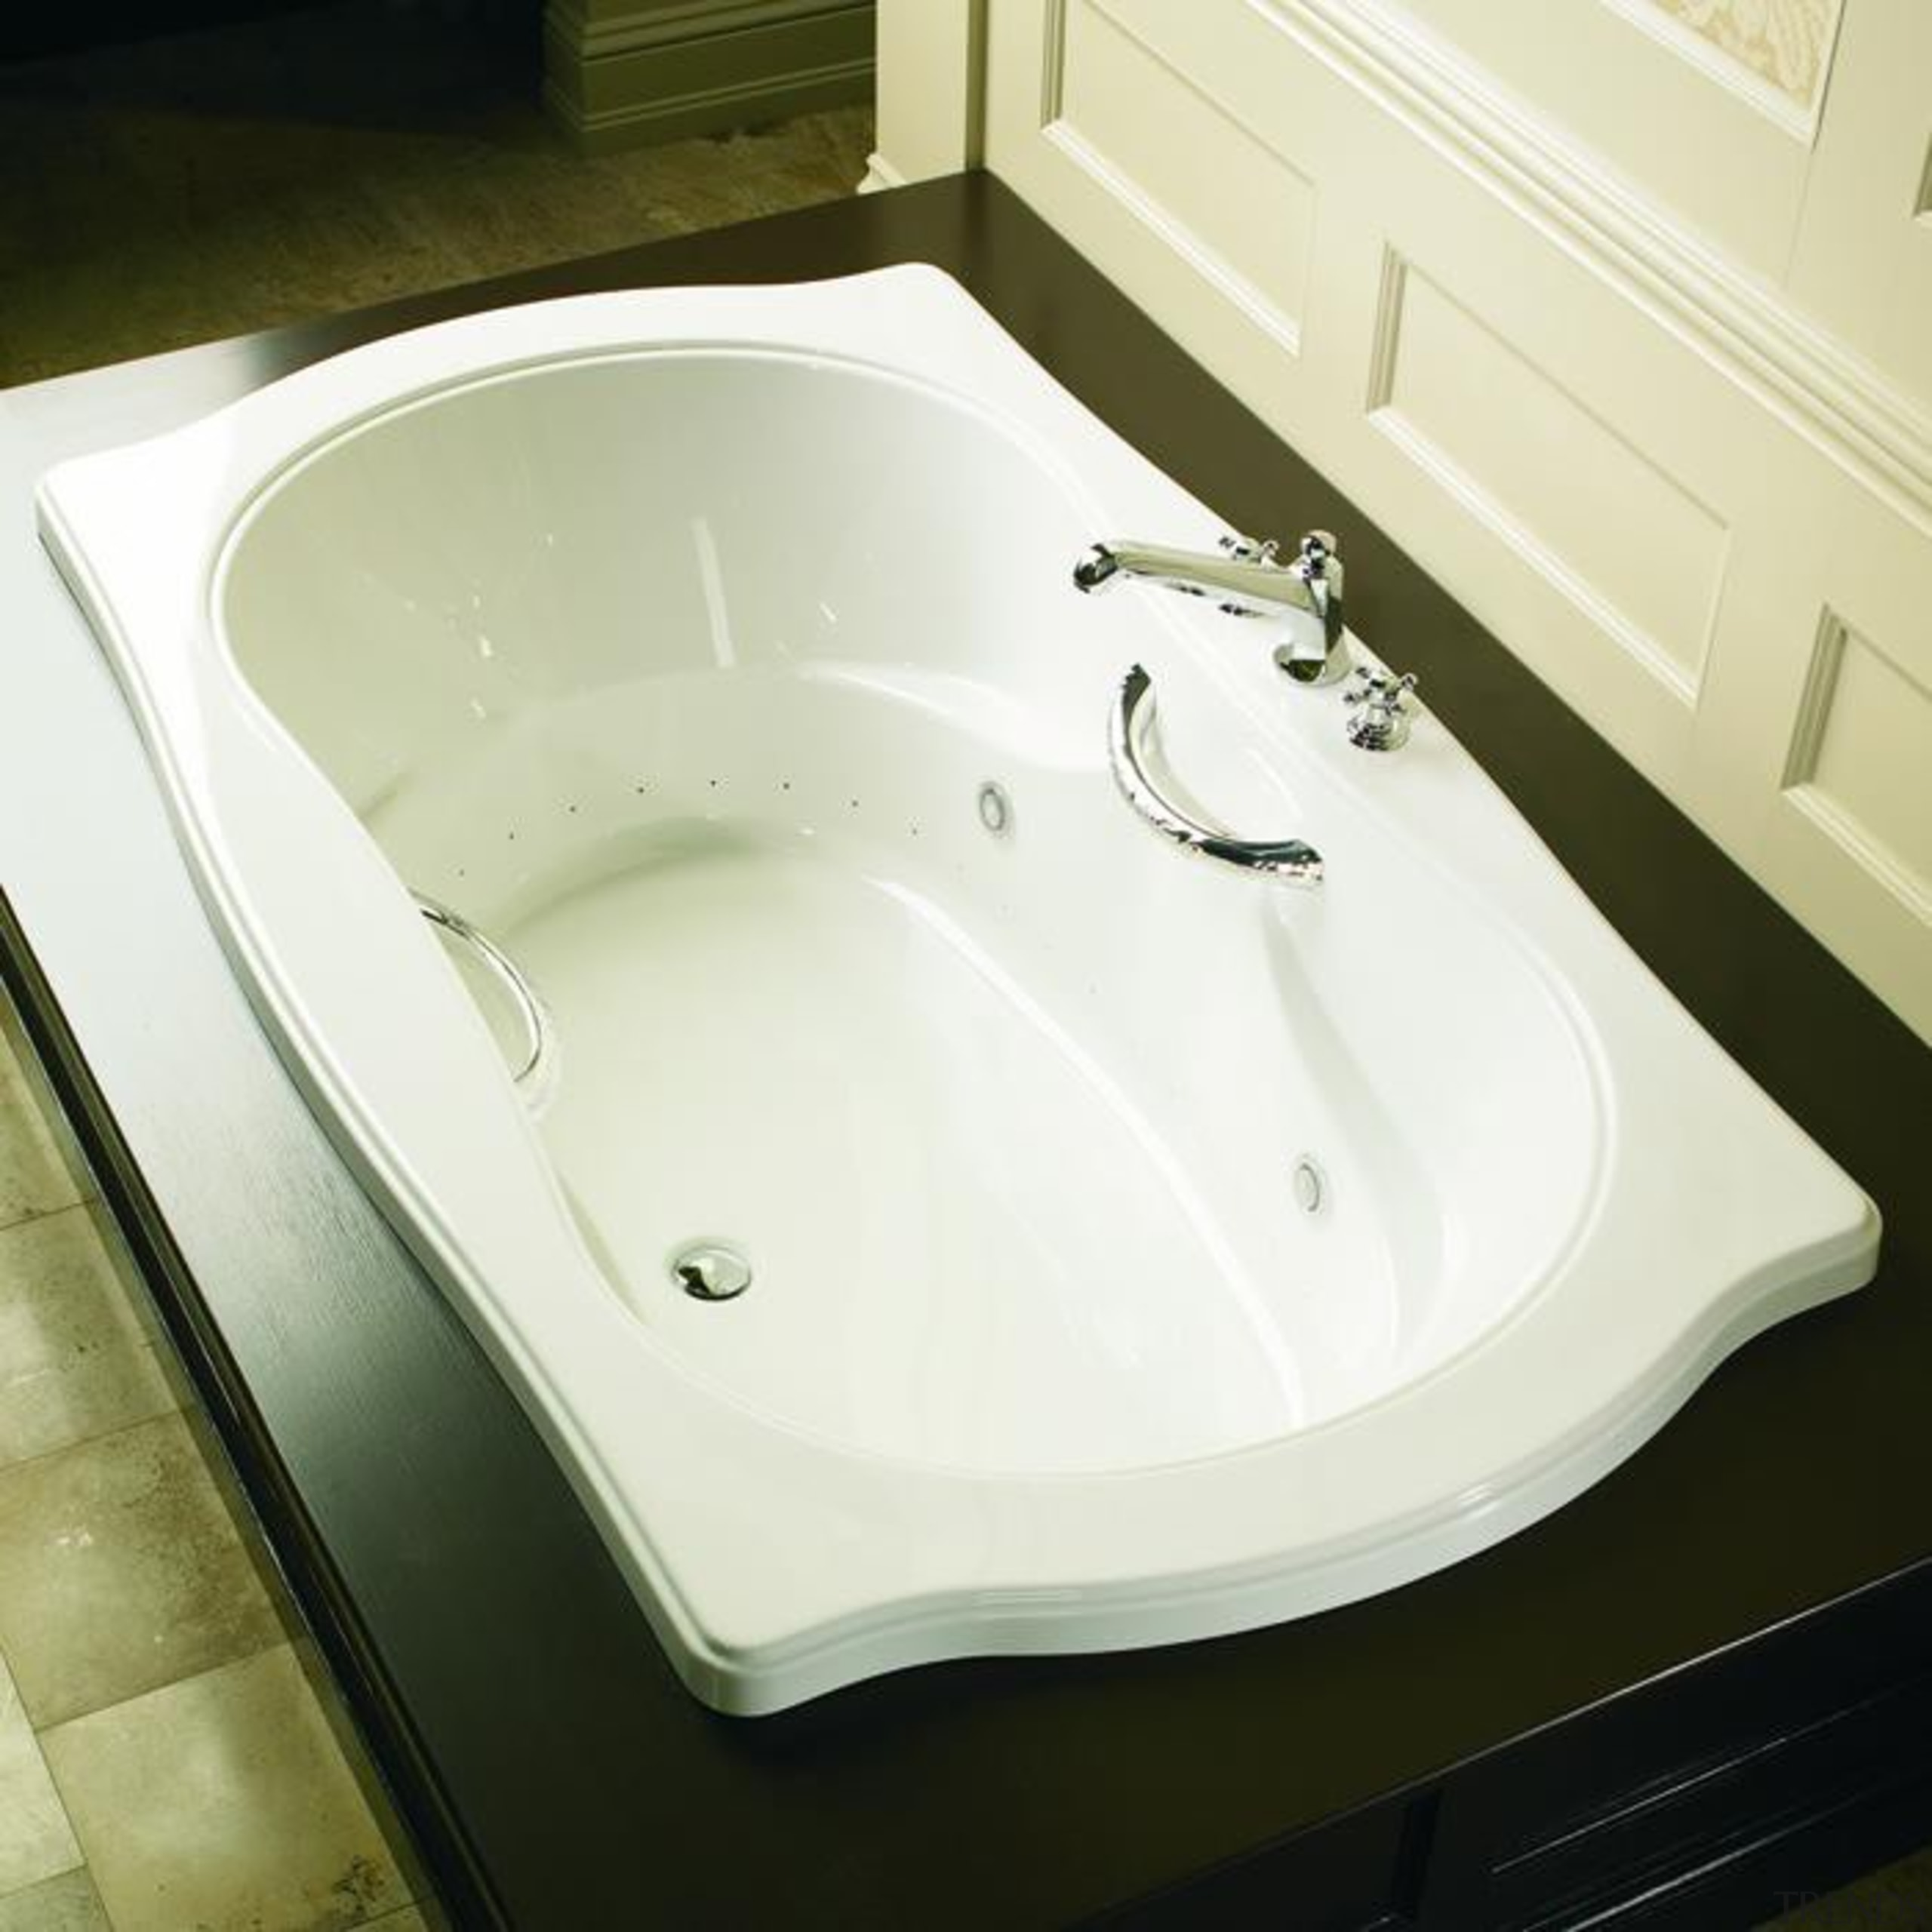 elegancia contour 13700x700.jpg - elegancia_contour_13700x700.jpg - angle | angle, bathroom, bathroom sink, bathtub, ceramic, floor, plumbing fixture, product design, sink, tap, white, brown